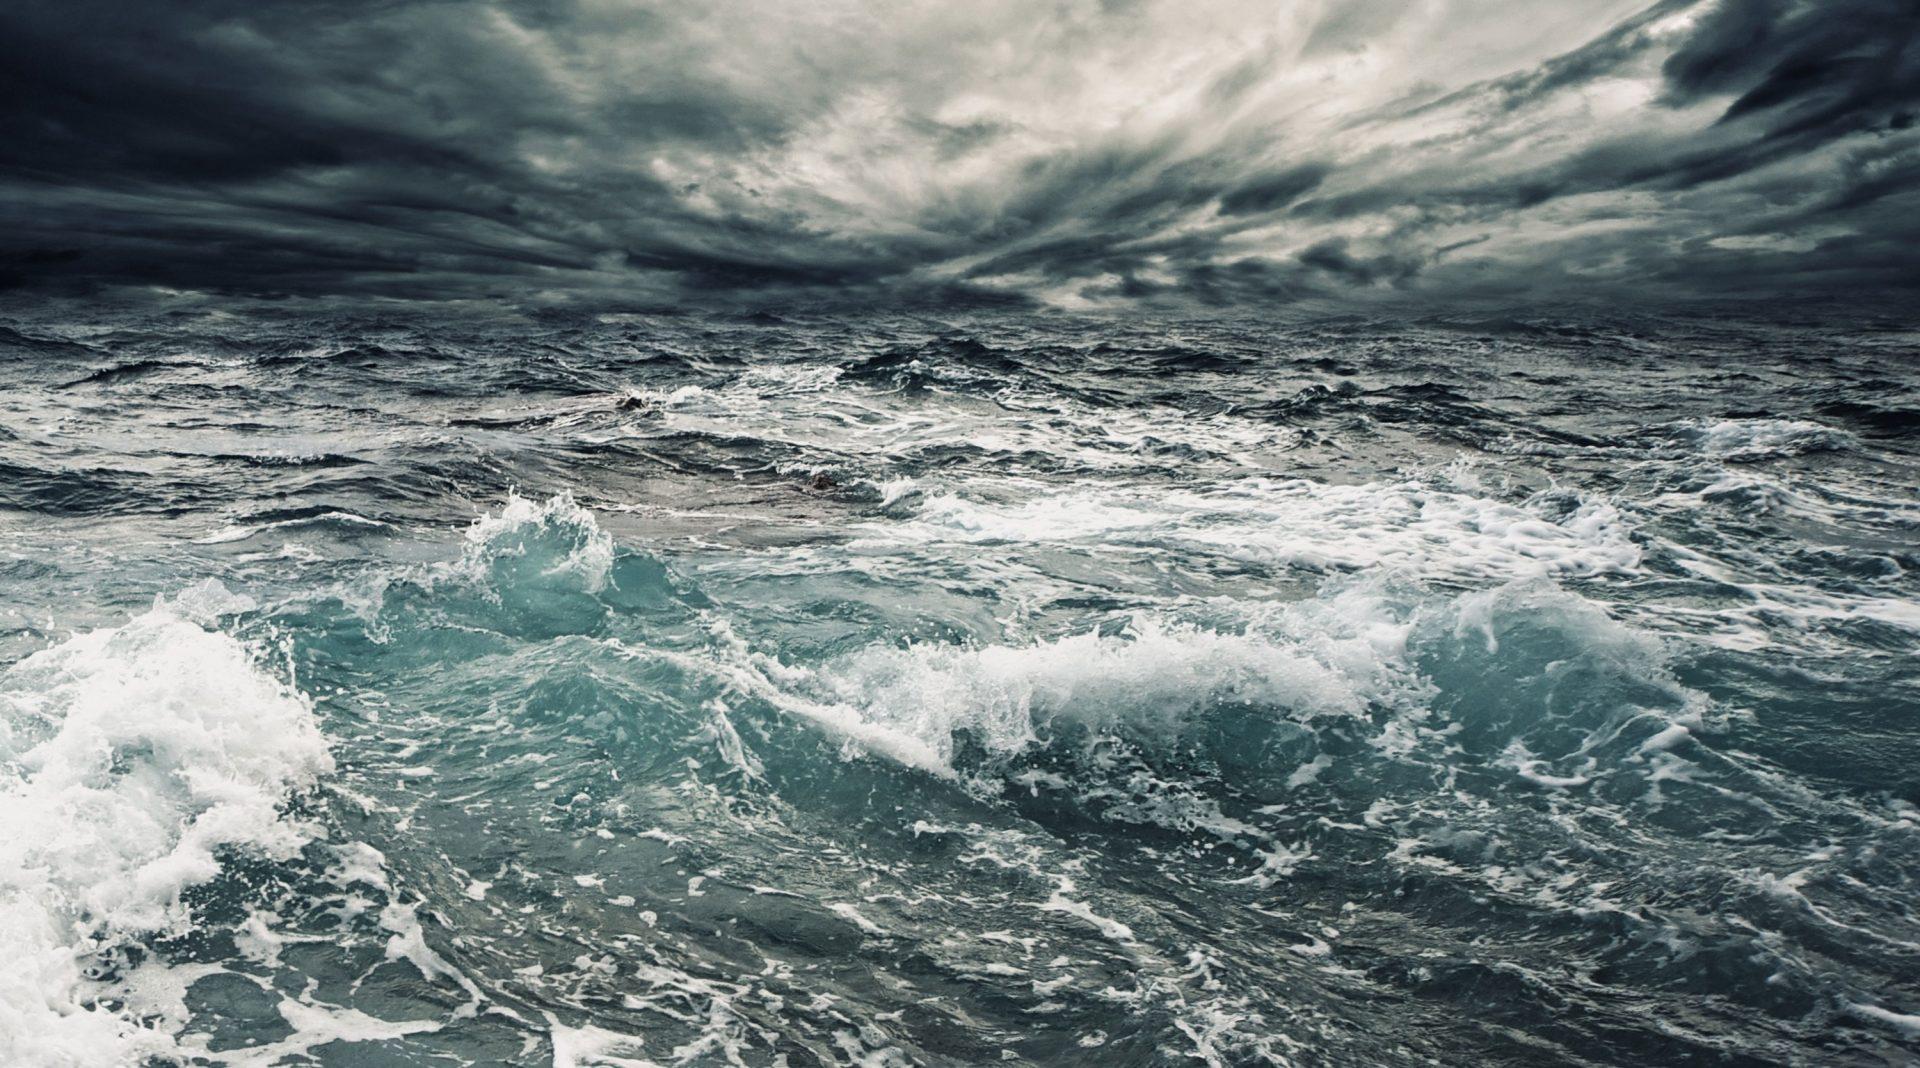 Ocean4Cast marine weather forecast